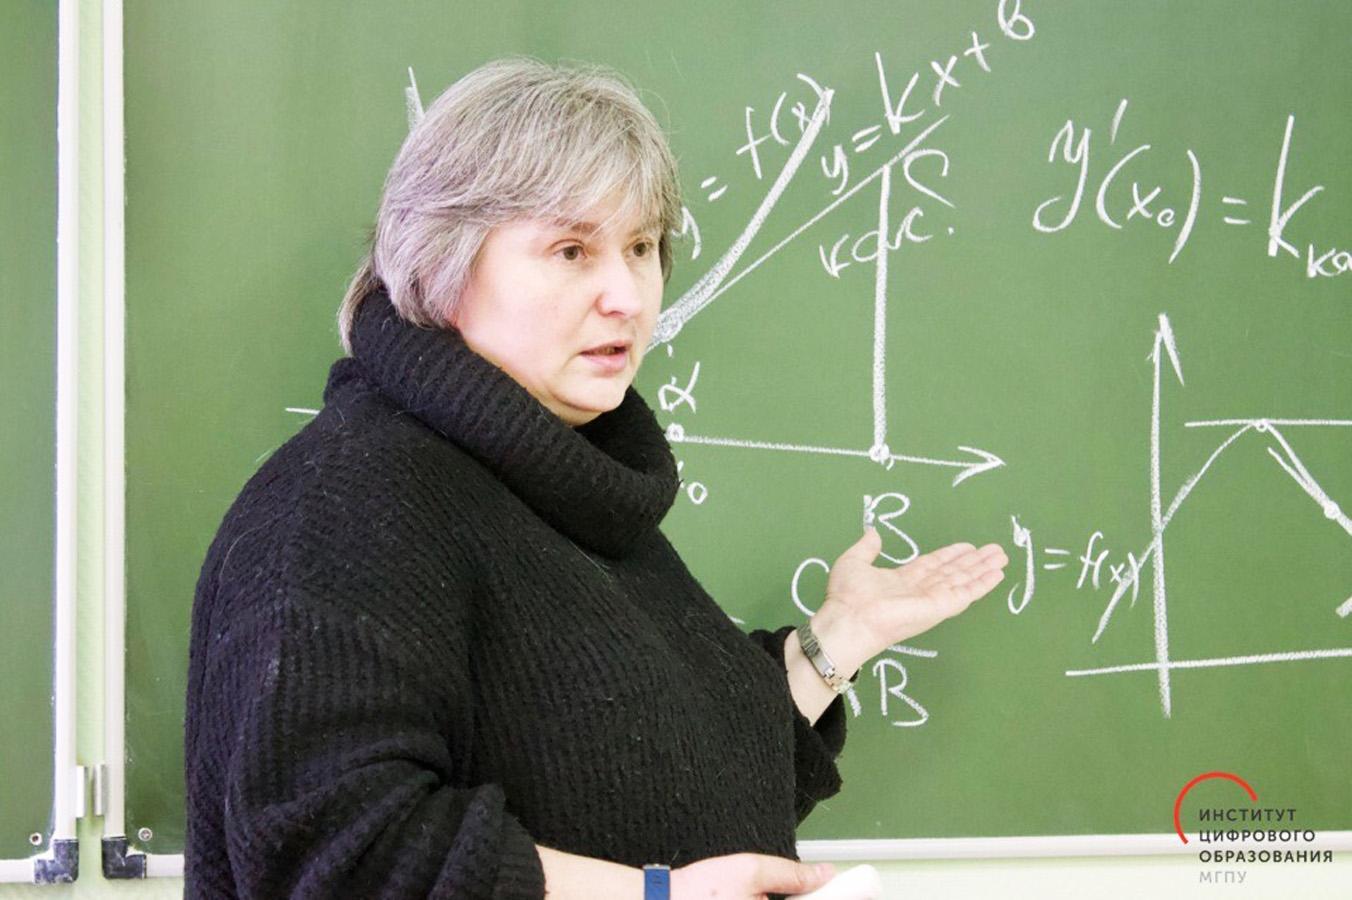 Преподавателю ИЦО присуждена премия «Люди МГПУ»